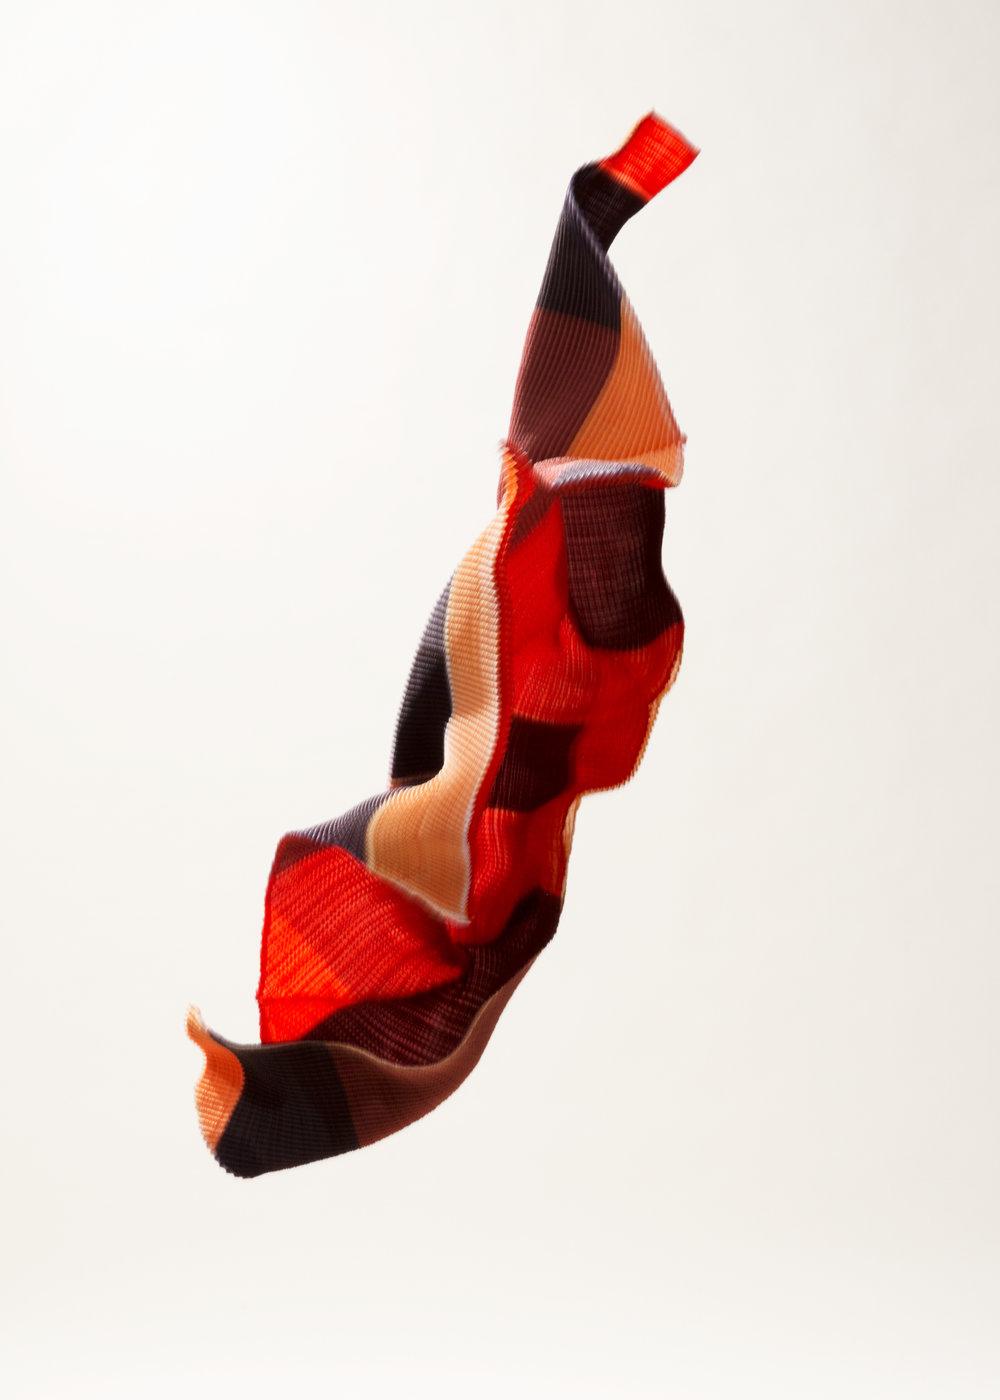 Totokaelo-FabricStory-3.jpg